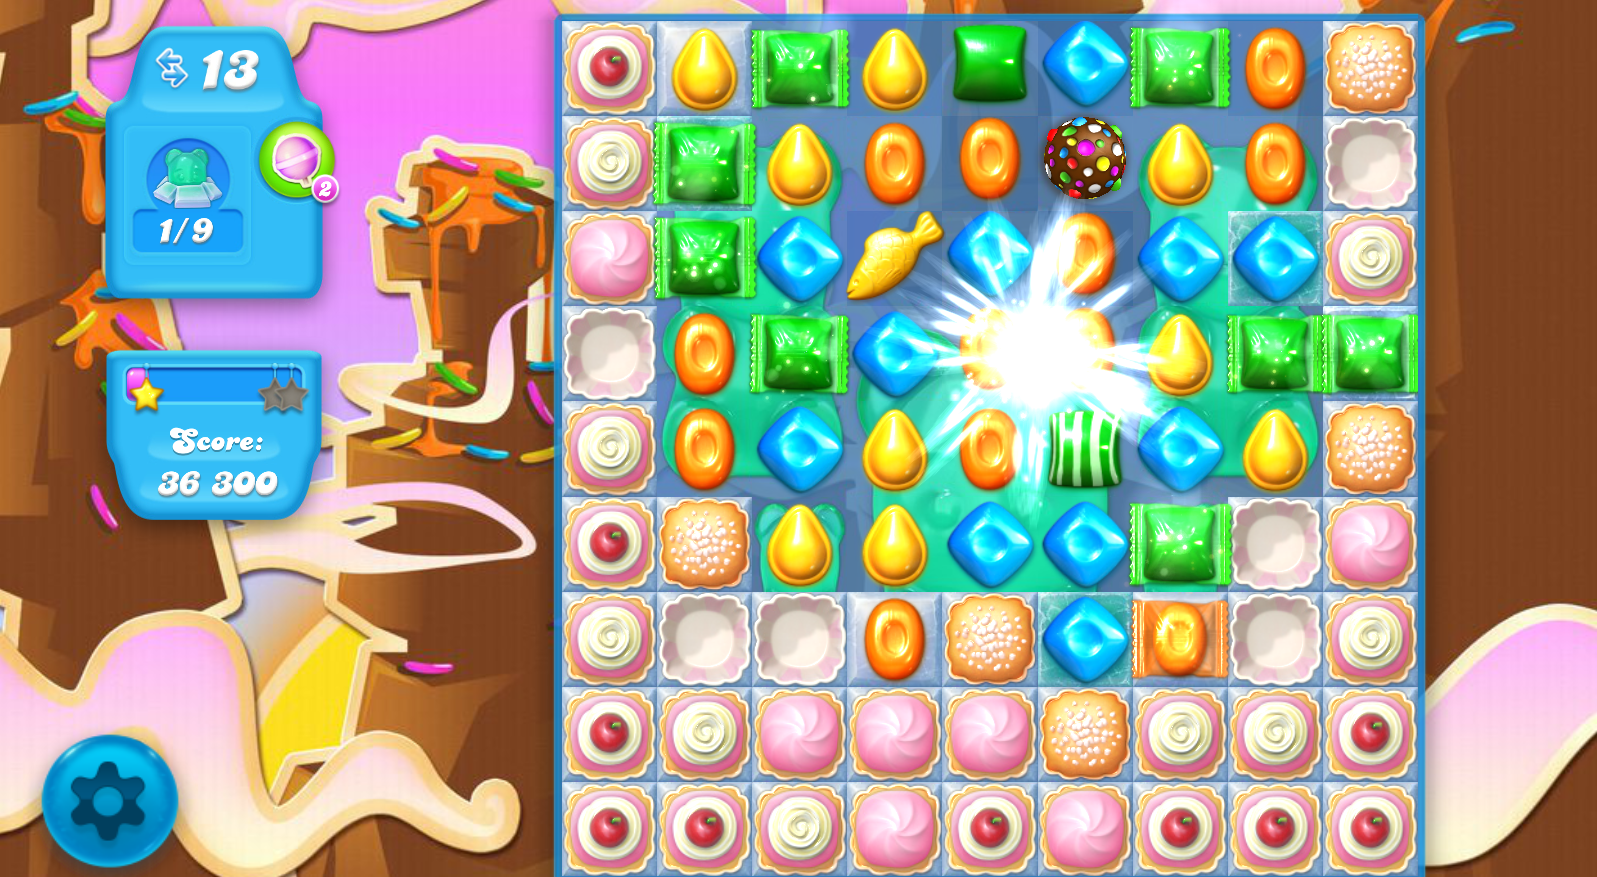 Download Candy Crush Soda Saga v1.73.9 Apk Mega Mod - Mtk free